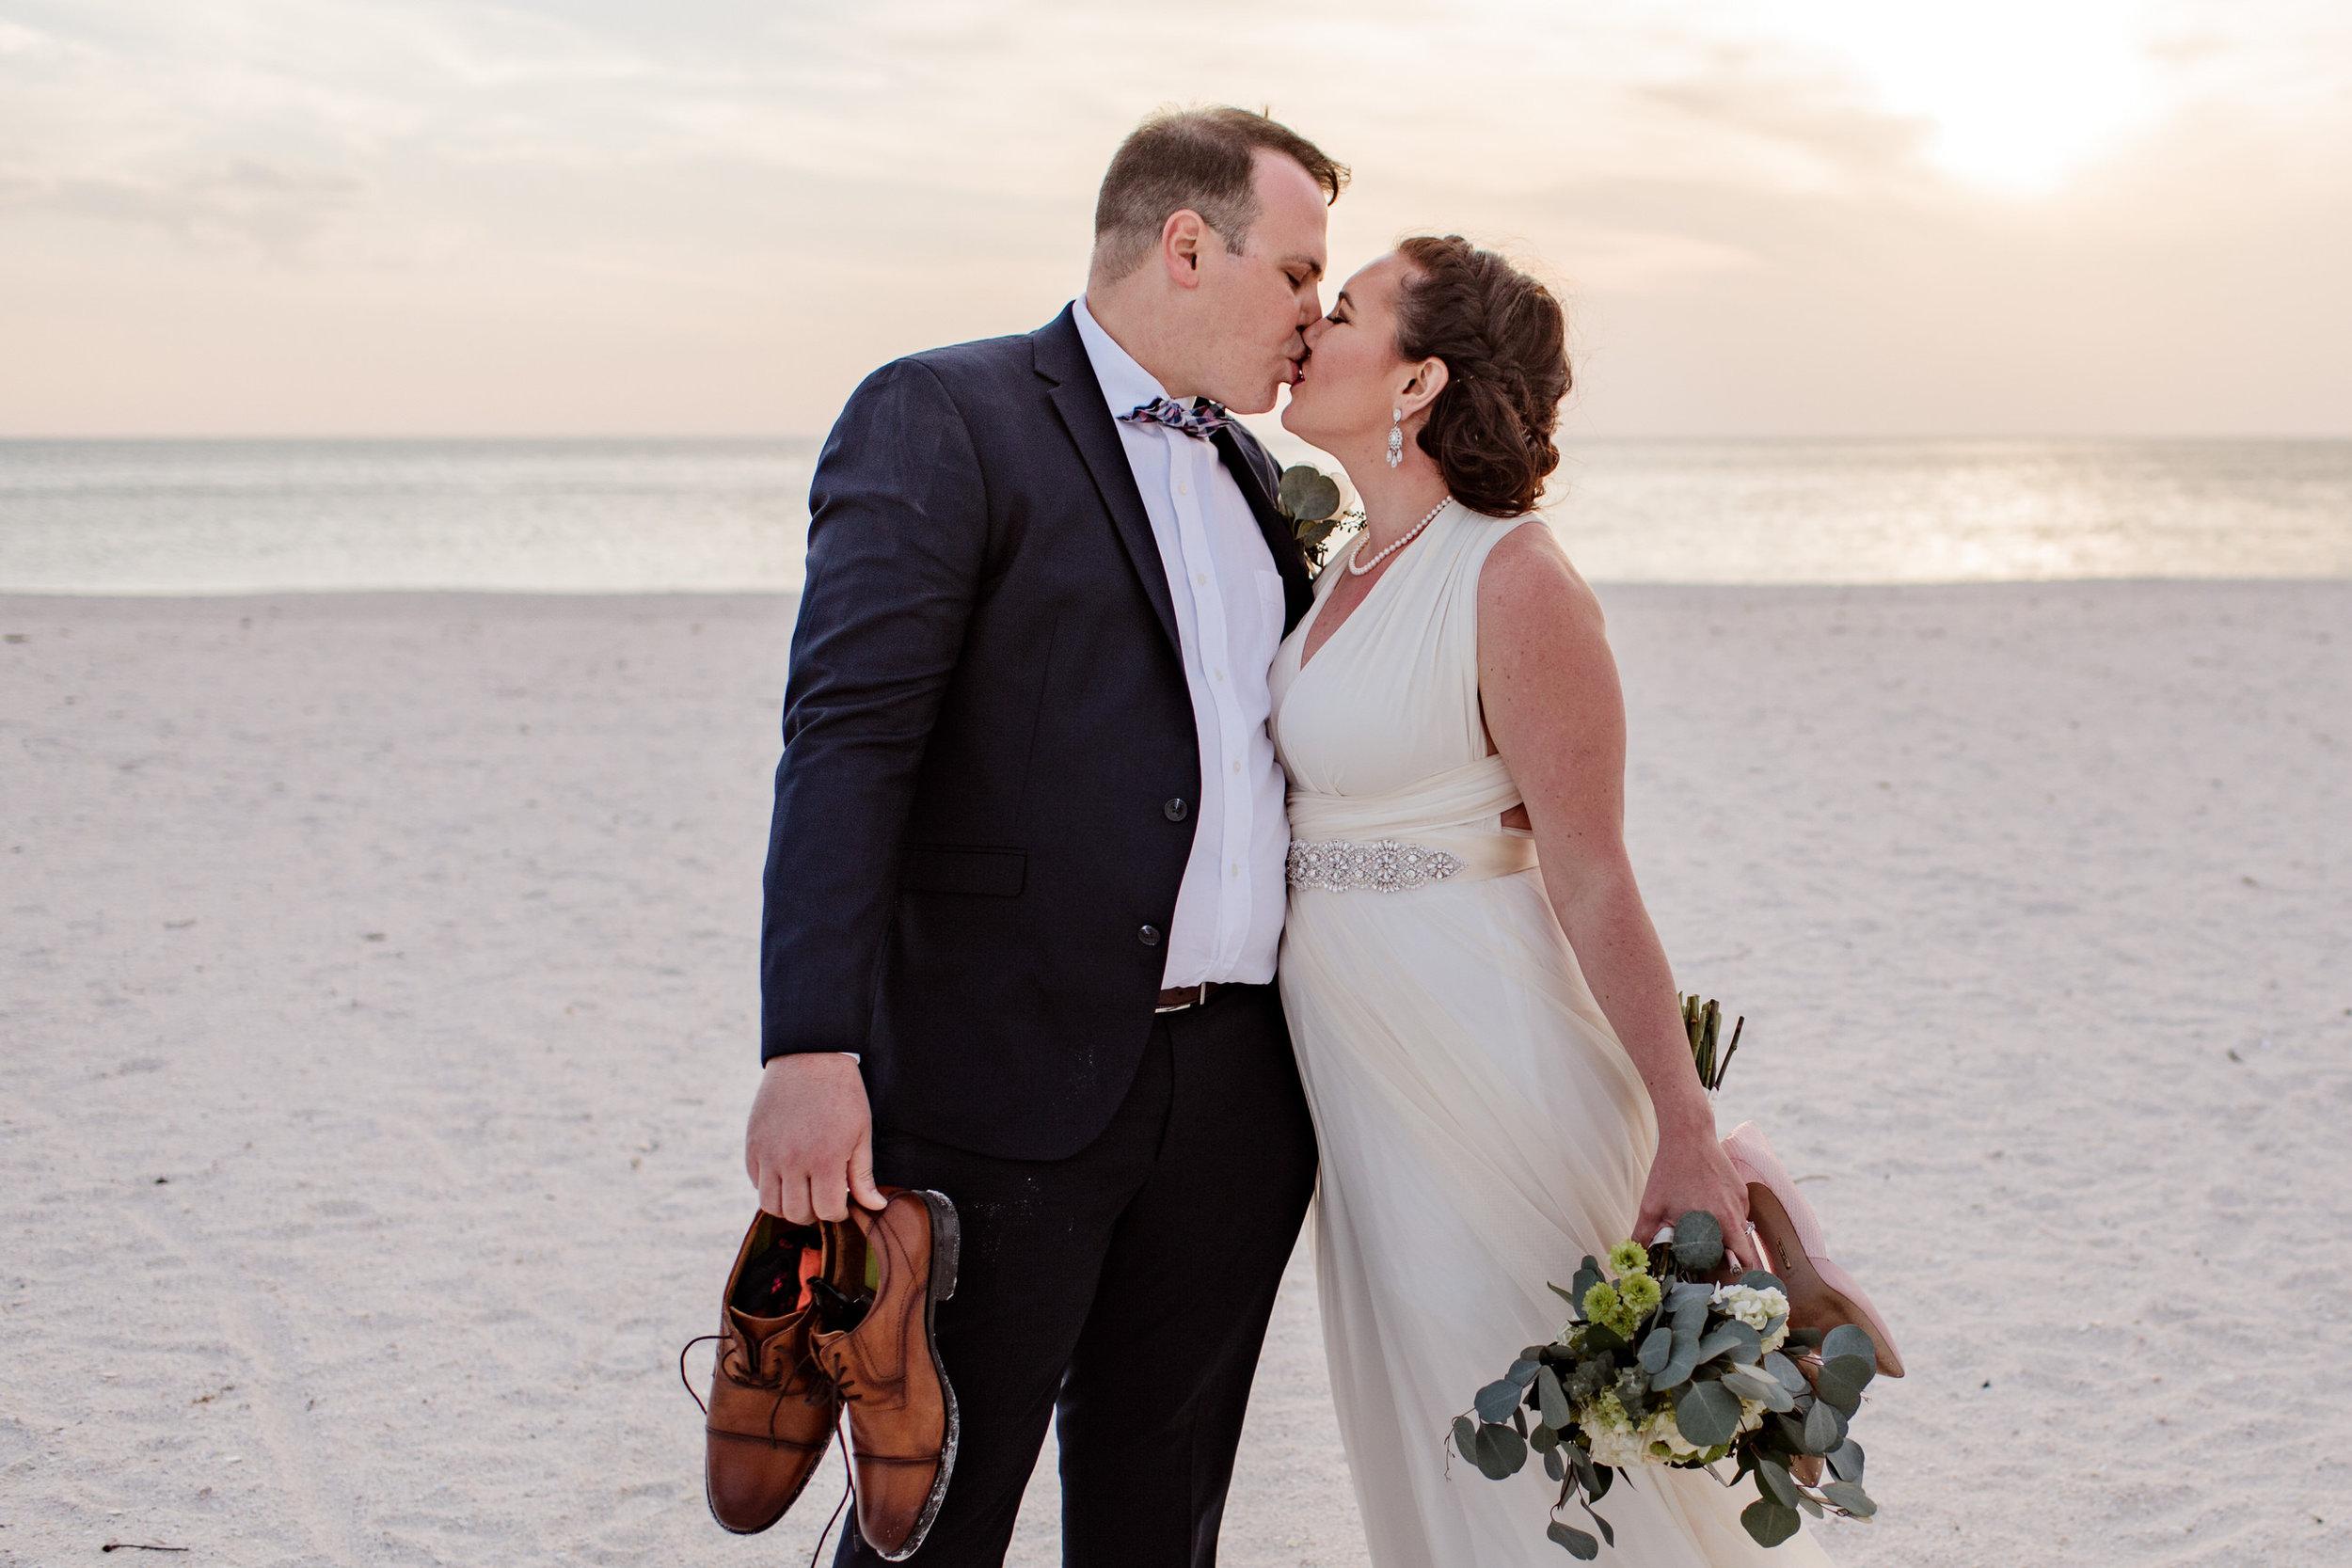 Beltran_Treasure_Island_Elopement_Tampa_Wedding_140-1.jpg